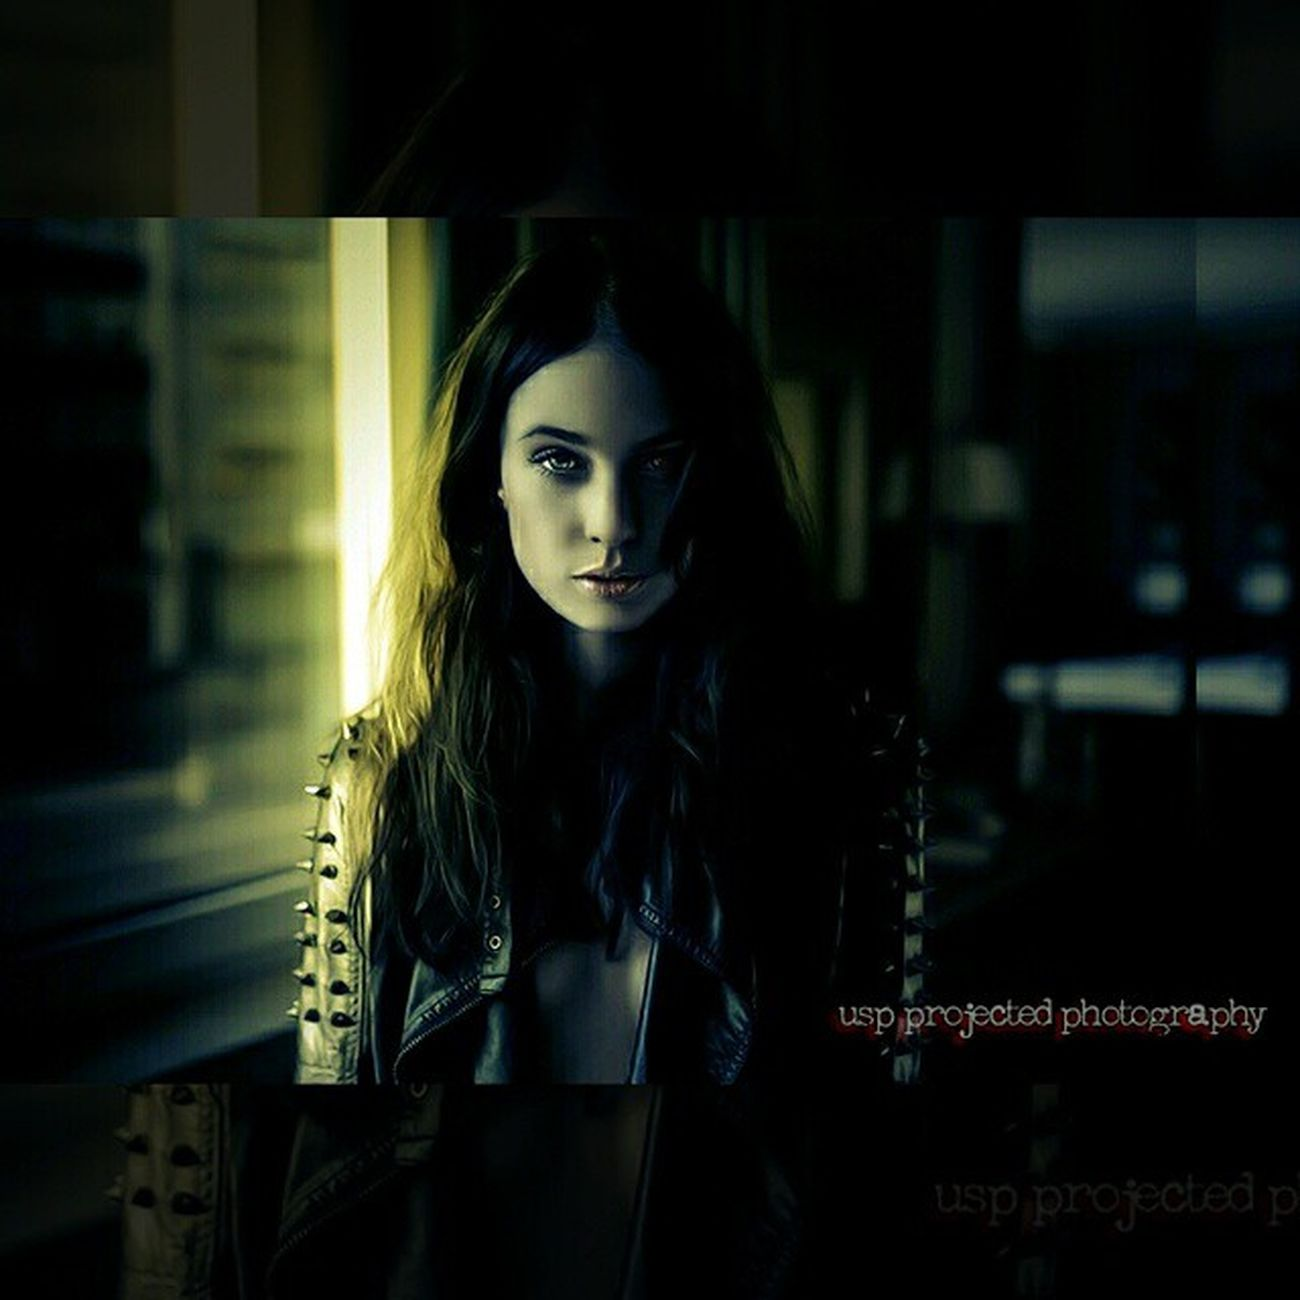 Half girl of night Dream_editors Digitalart  Digitaldreams Edit_perfection Digital Drawing Digitalism Digital Eye Masters